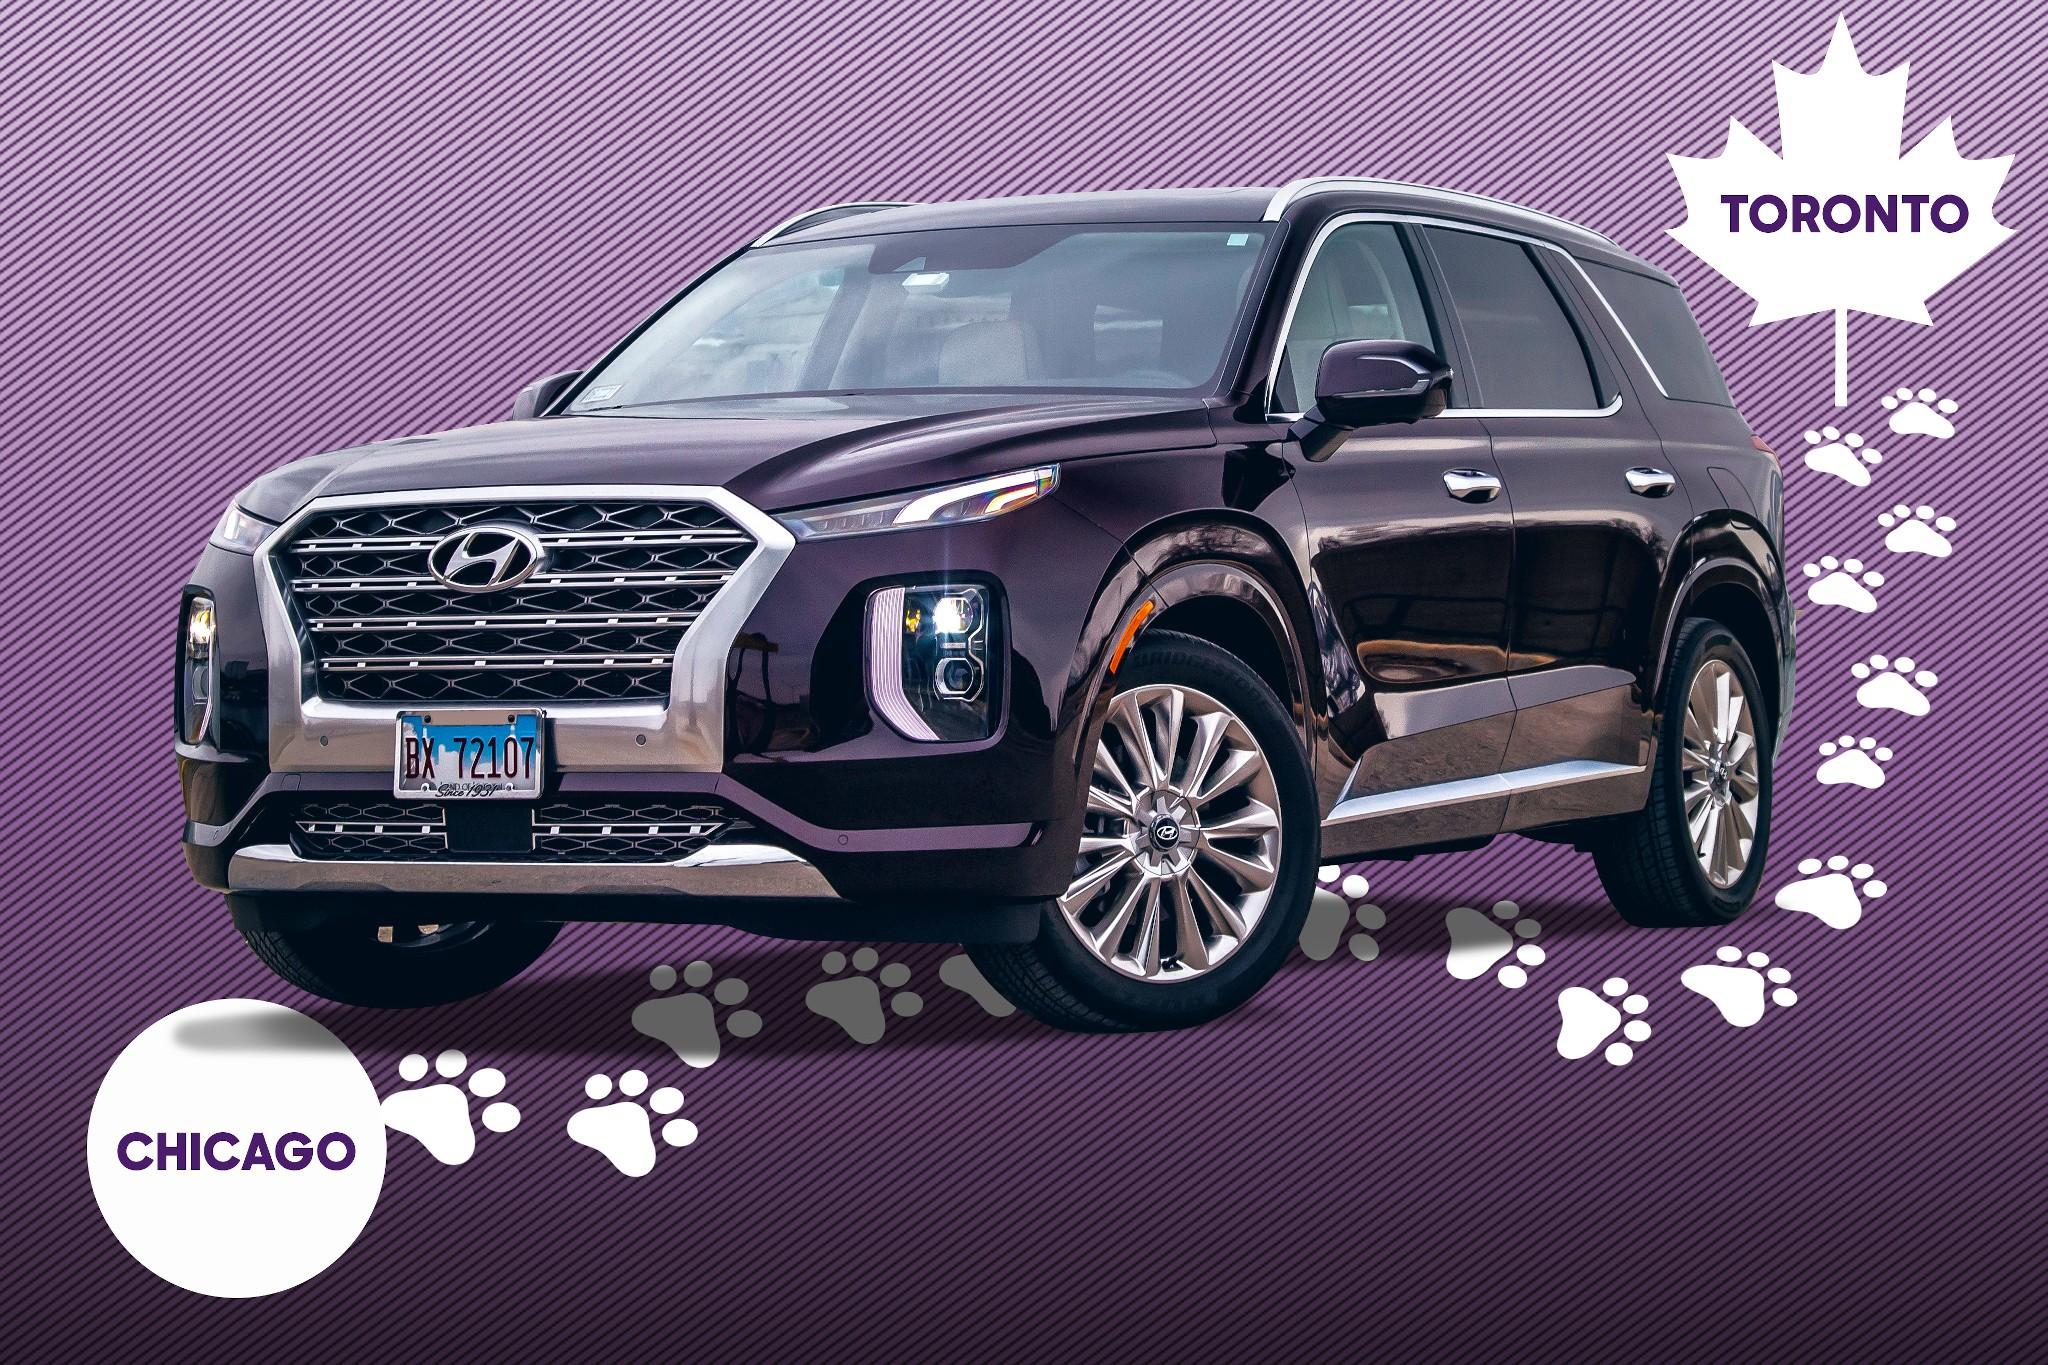 2020 Hyundai Palisade: Fuel Economy, Canada … and 'Cats'